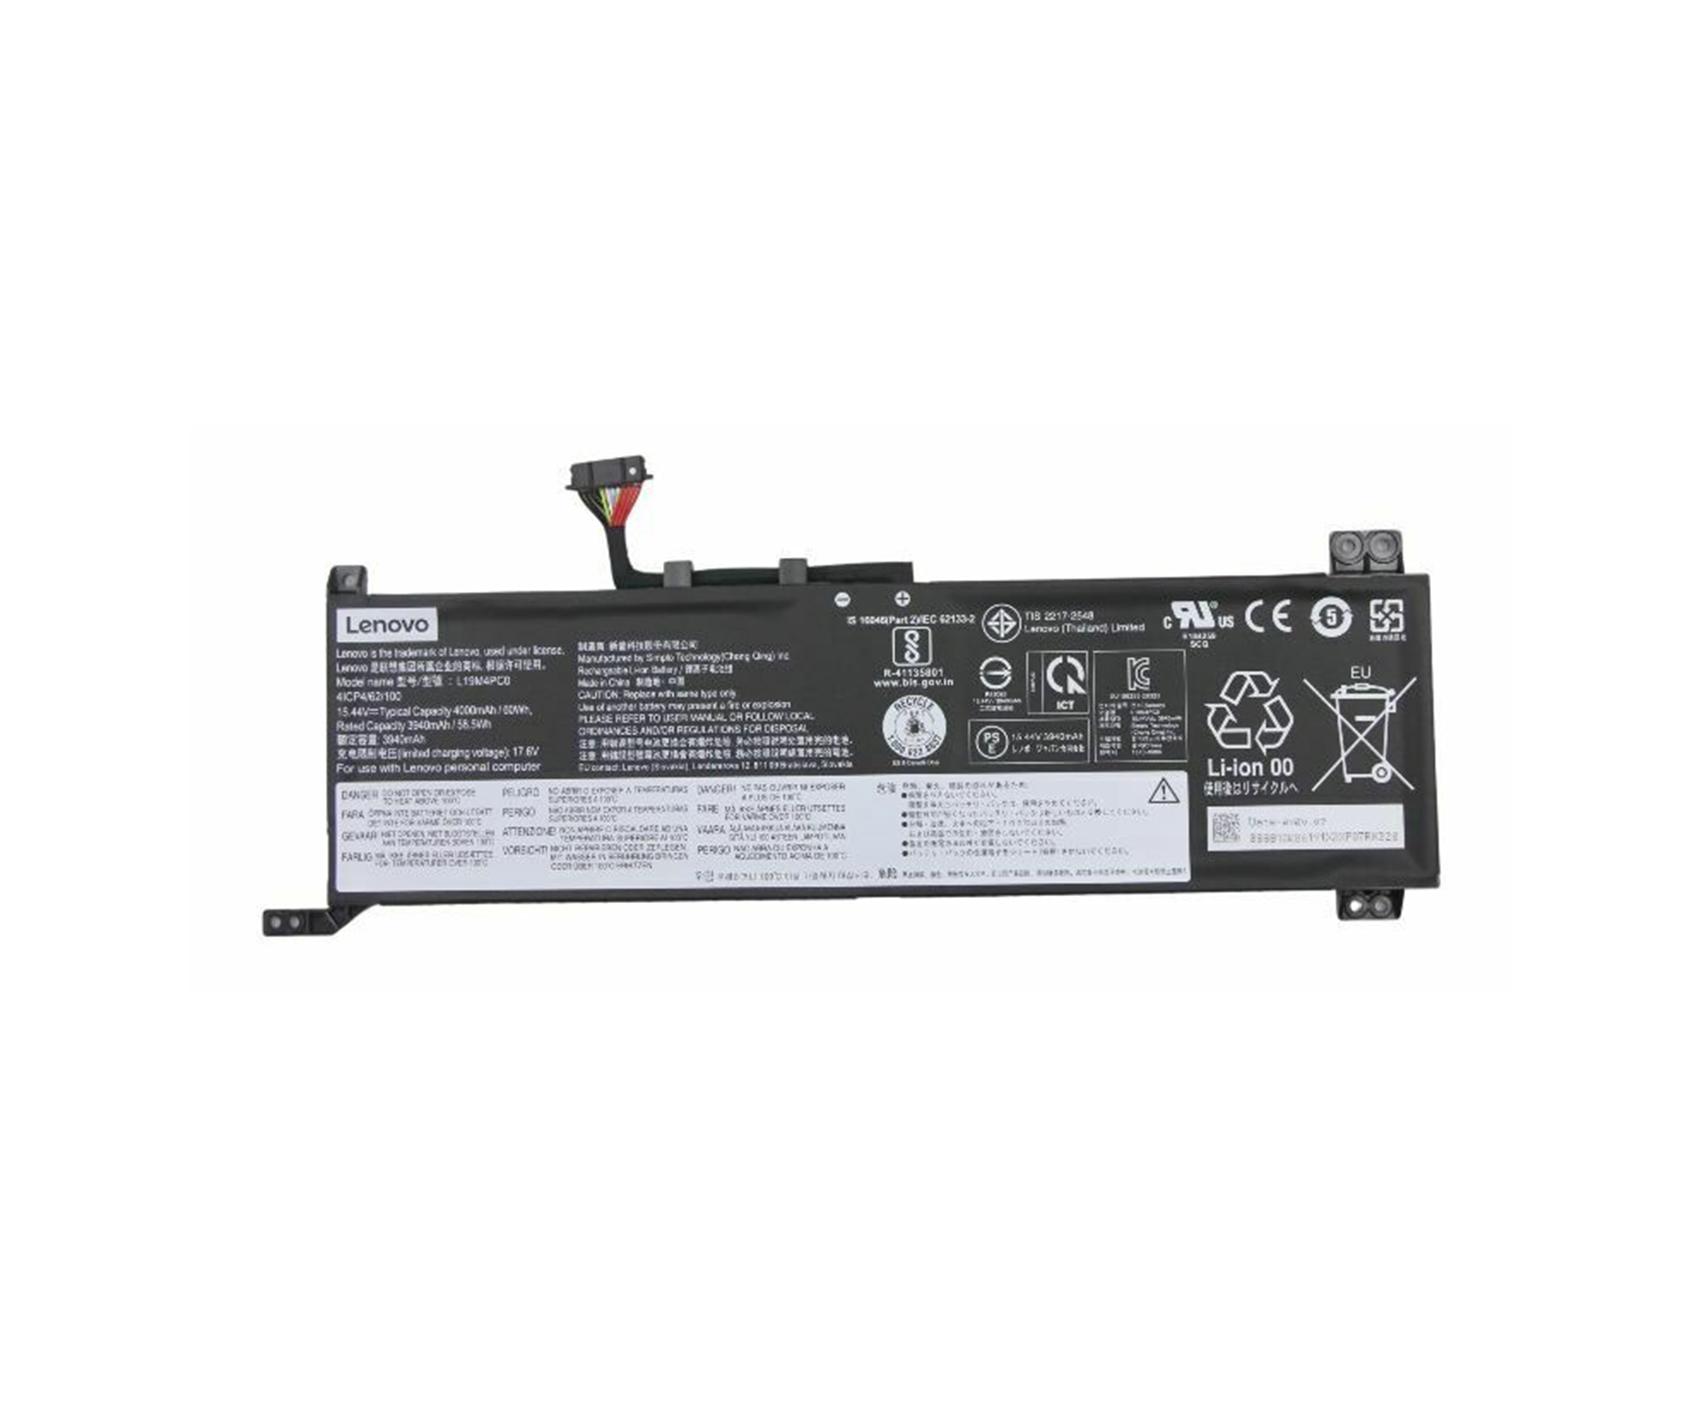 Lenovo Legion 5 Laptop Battery Relacement (5B10W86195 )